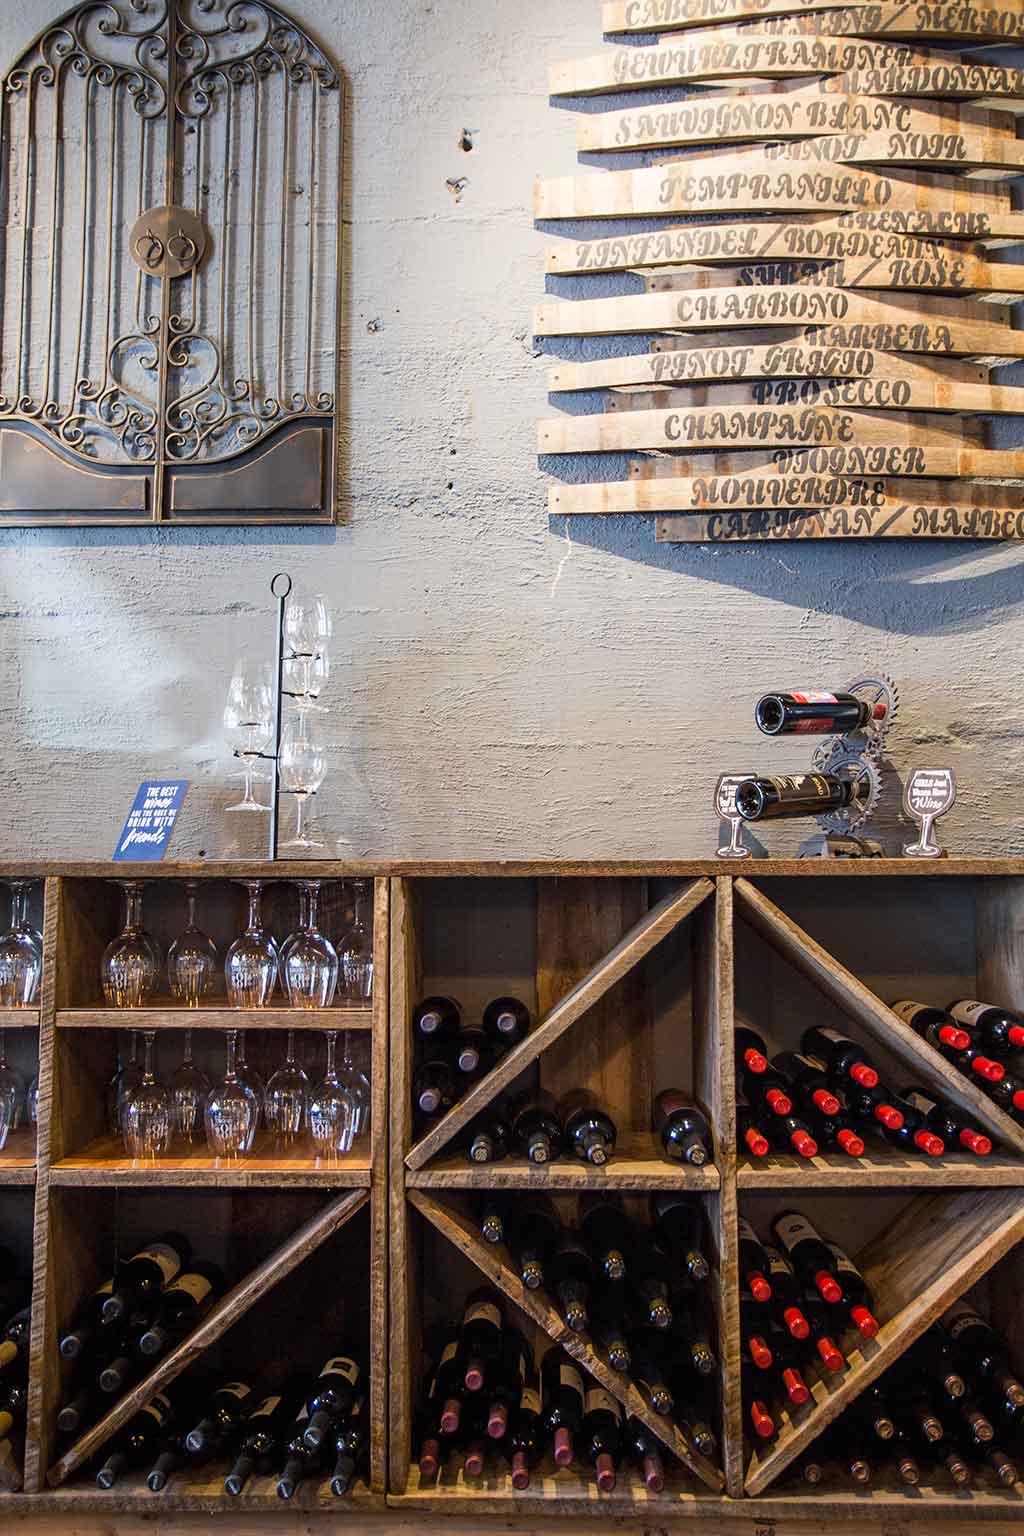 drive-swim-fly-18th-barrel-wine-and-beer-tasting-room-san-juan-bautista-california-alcohol-wine-rack